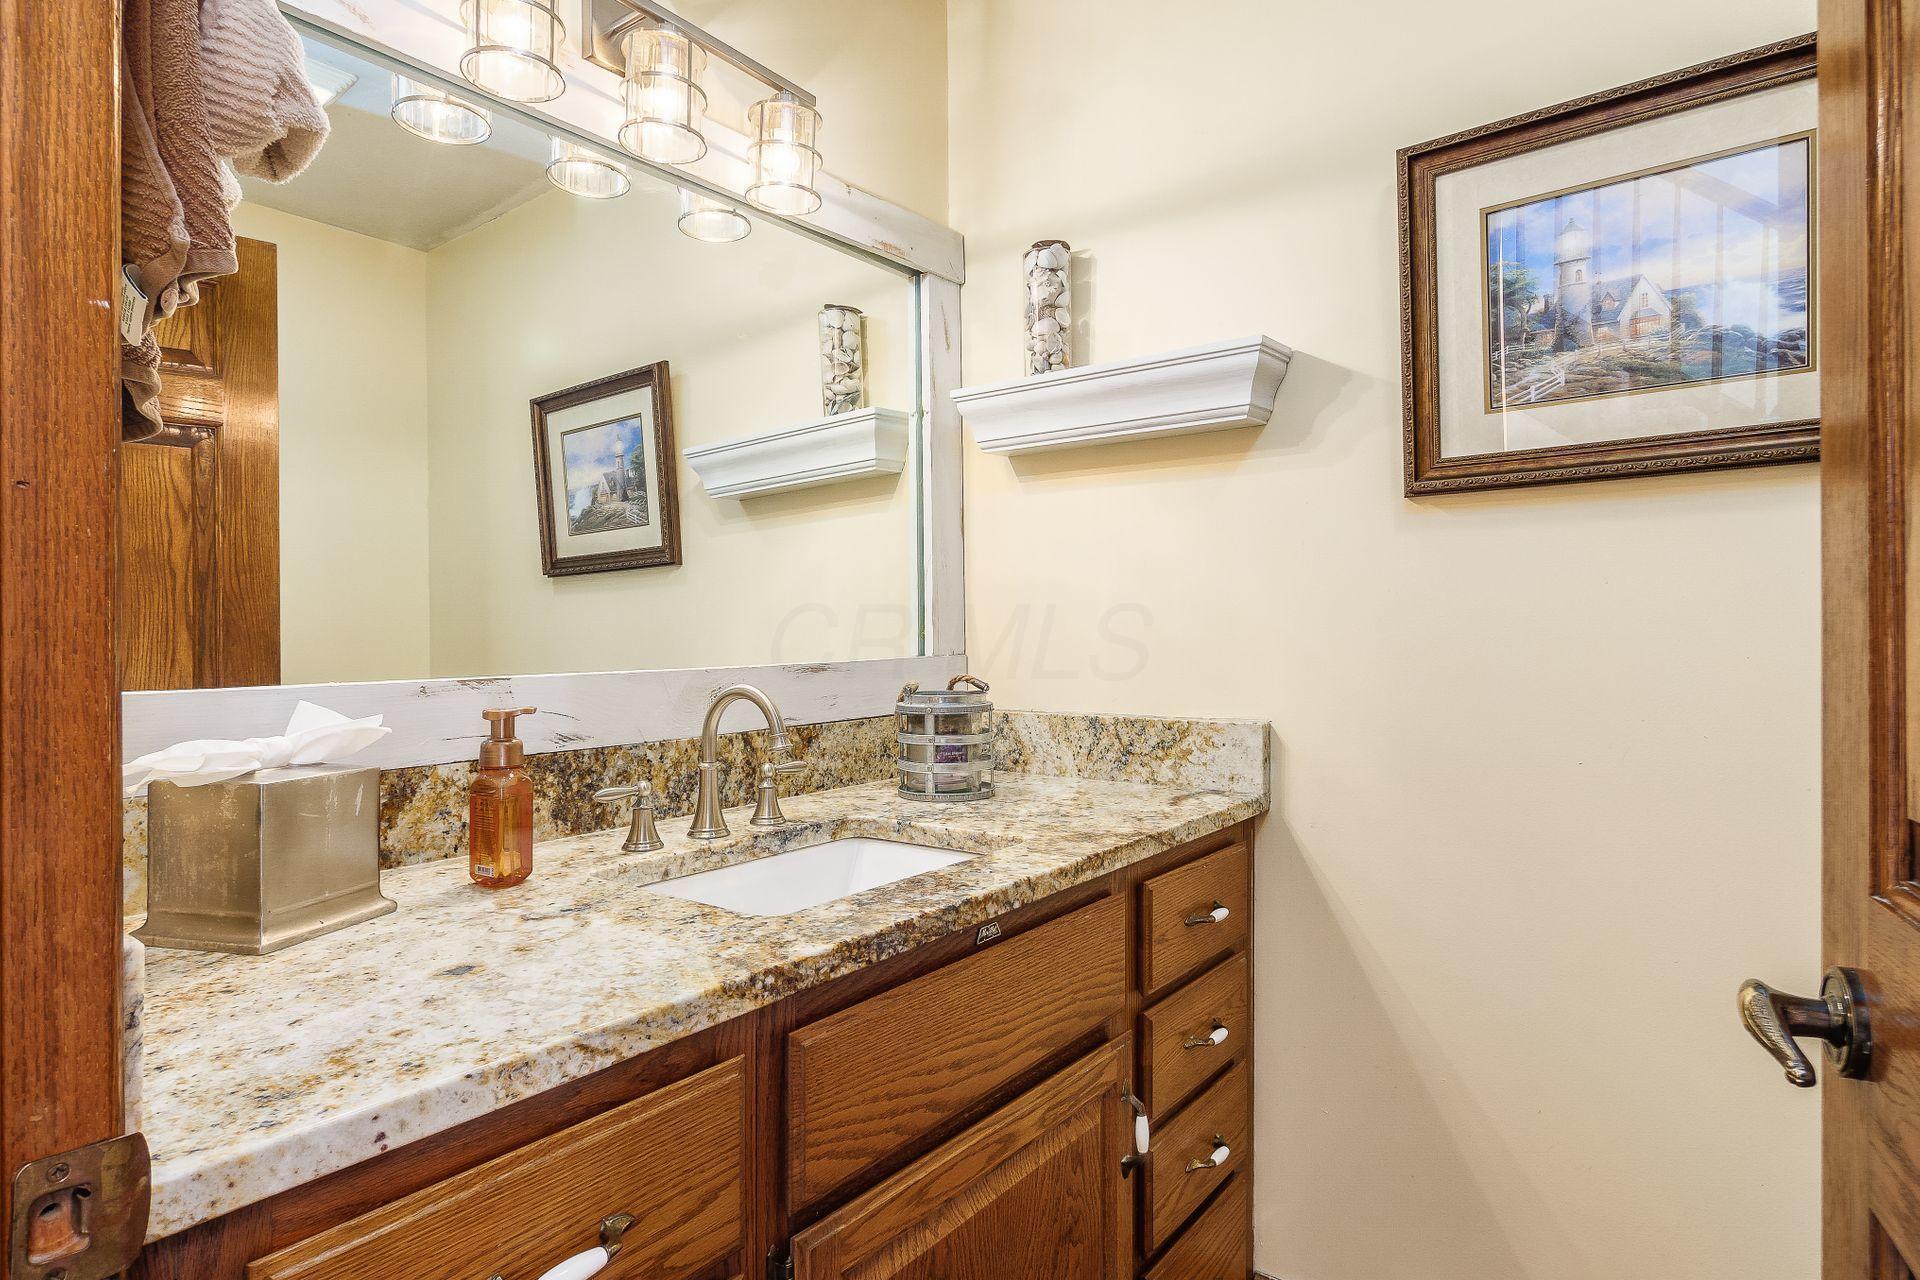 7976 Morris Road, Hilliard, Ohio 43026, 4 Bedrooms Bedrooms, ,3 BathroomsBathrooms,Residential,For Sale,Morris,220040357